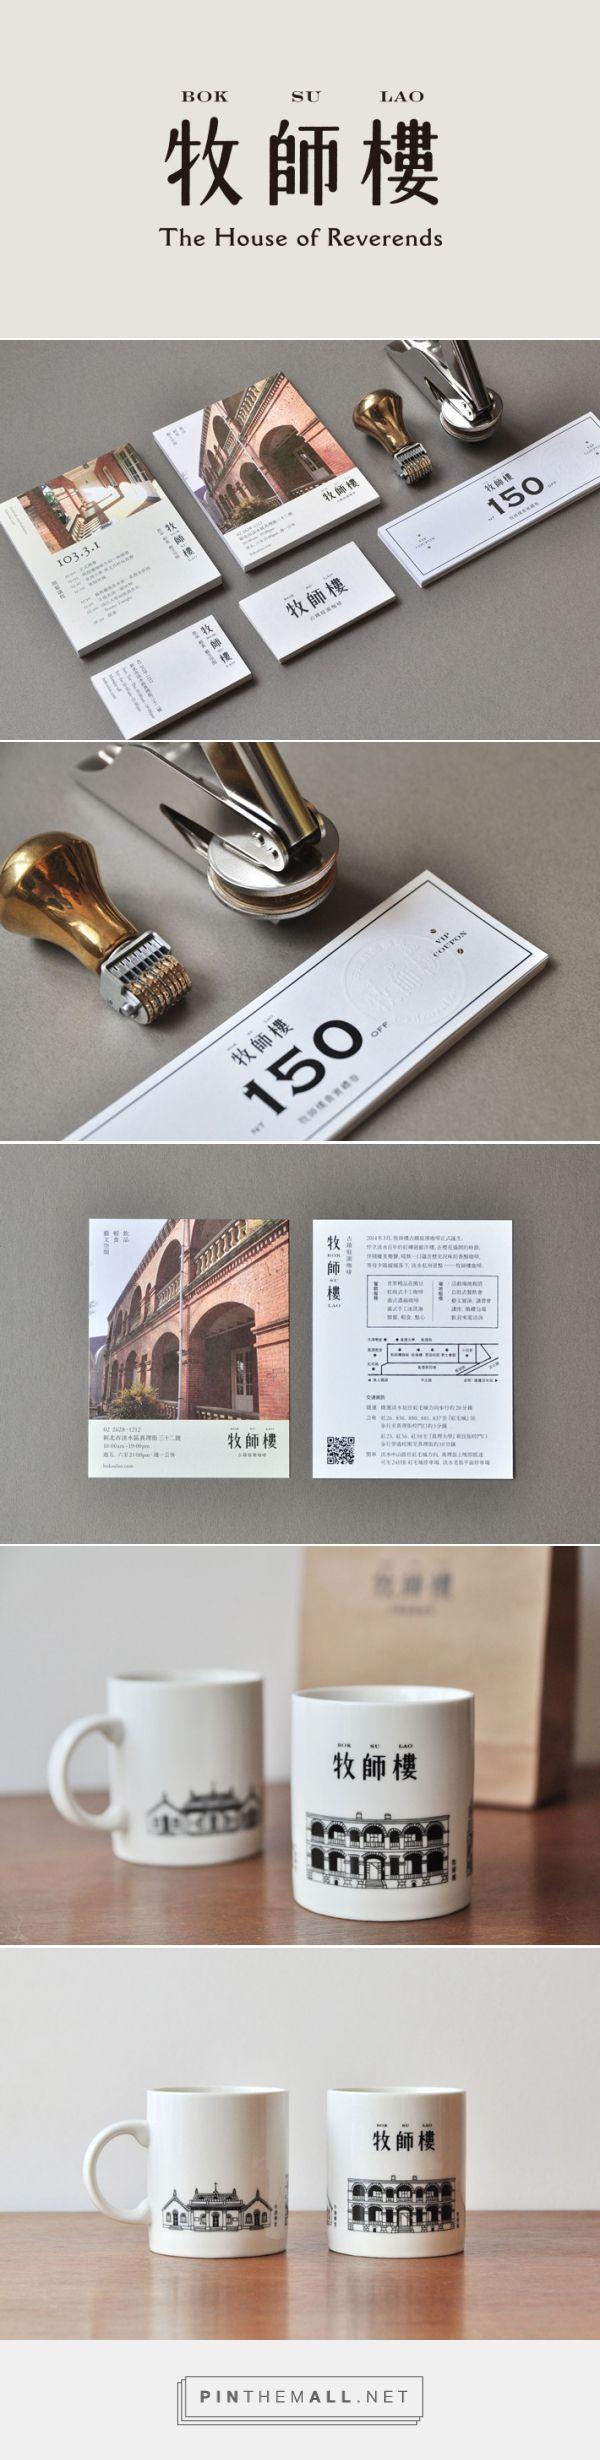 牧師樓 - 古蹟庭園咖啡 | Onion Design Associates - created via https://pinthemall.net